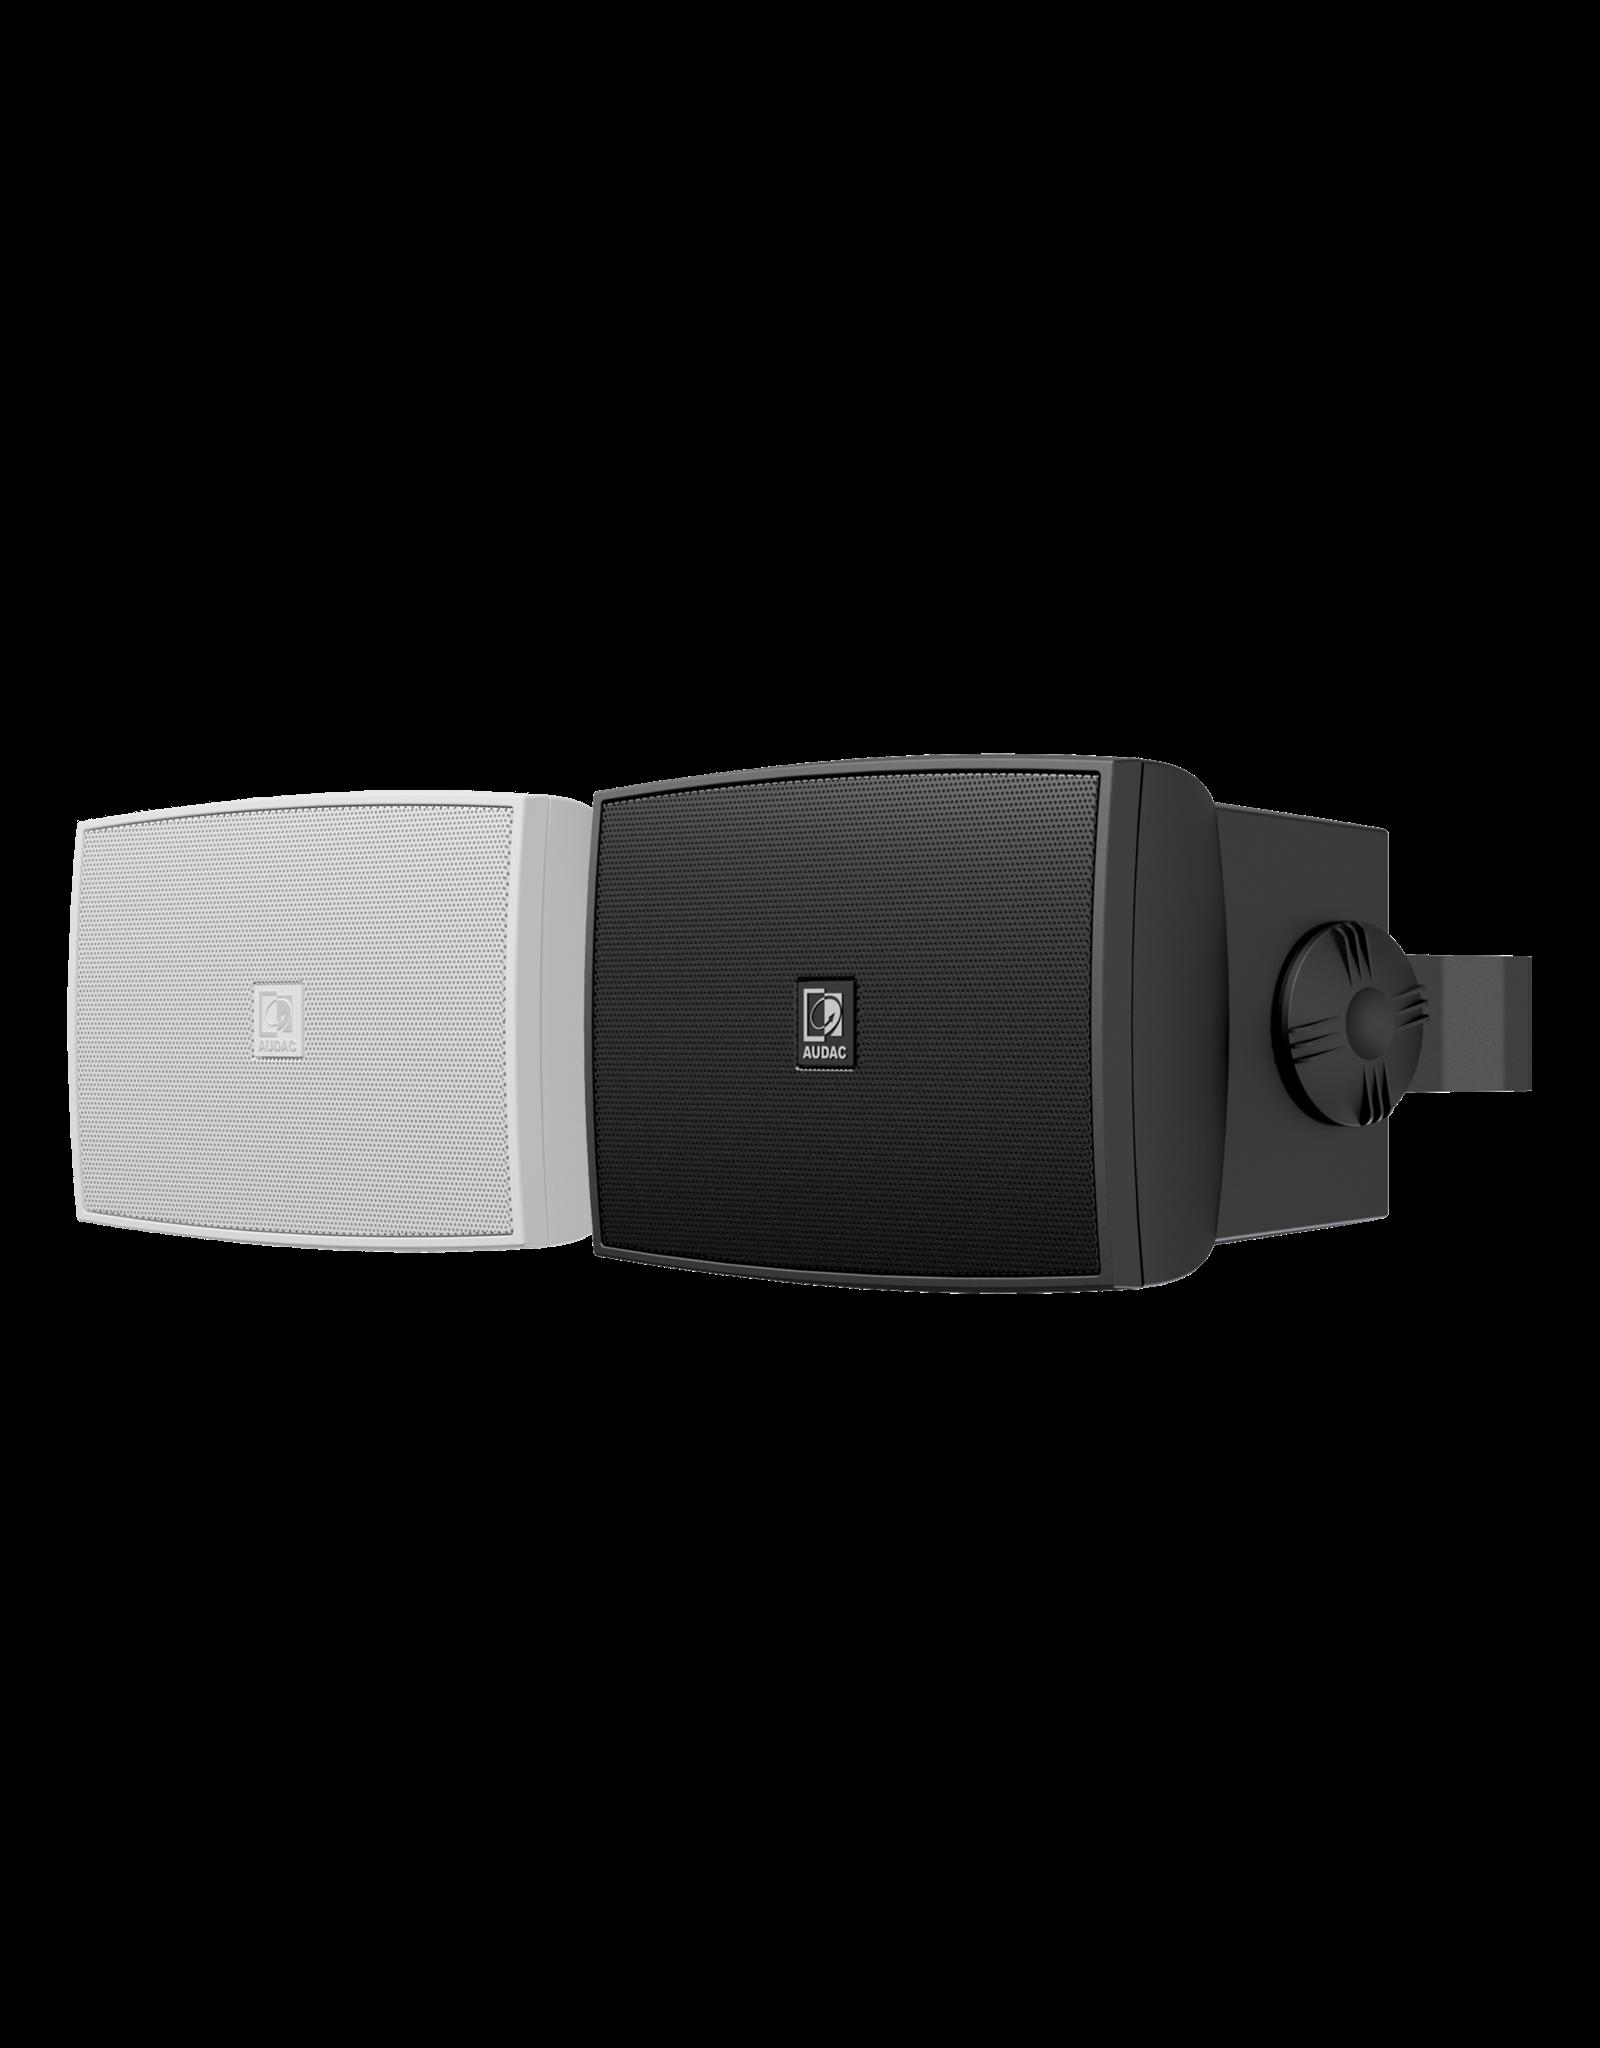 "Audac Outdoor universal wall speaker 3"" Outdoor black version"